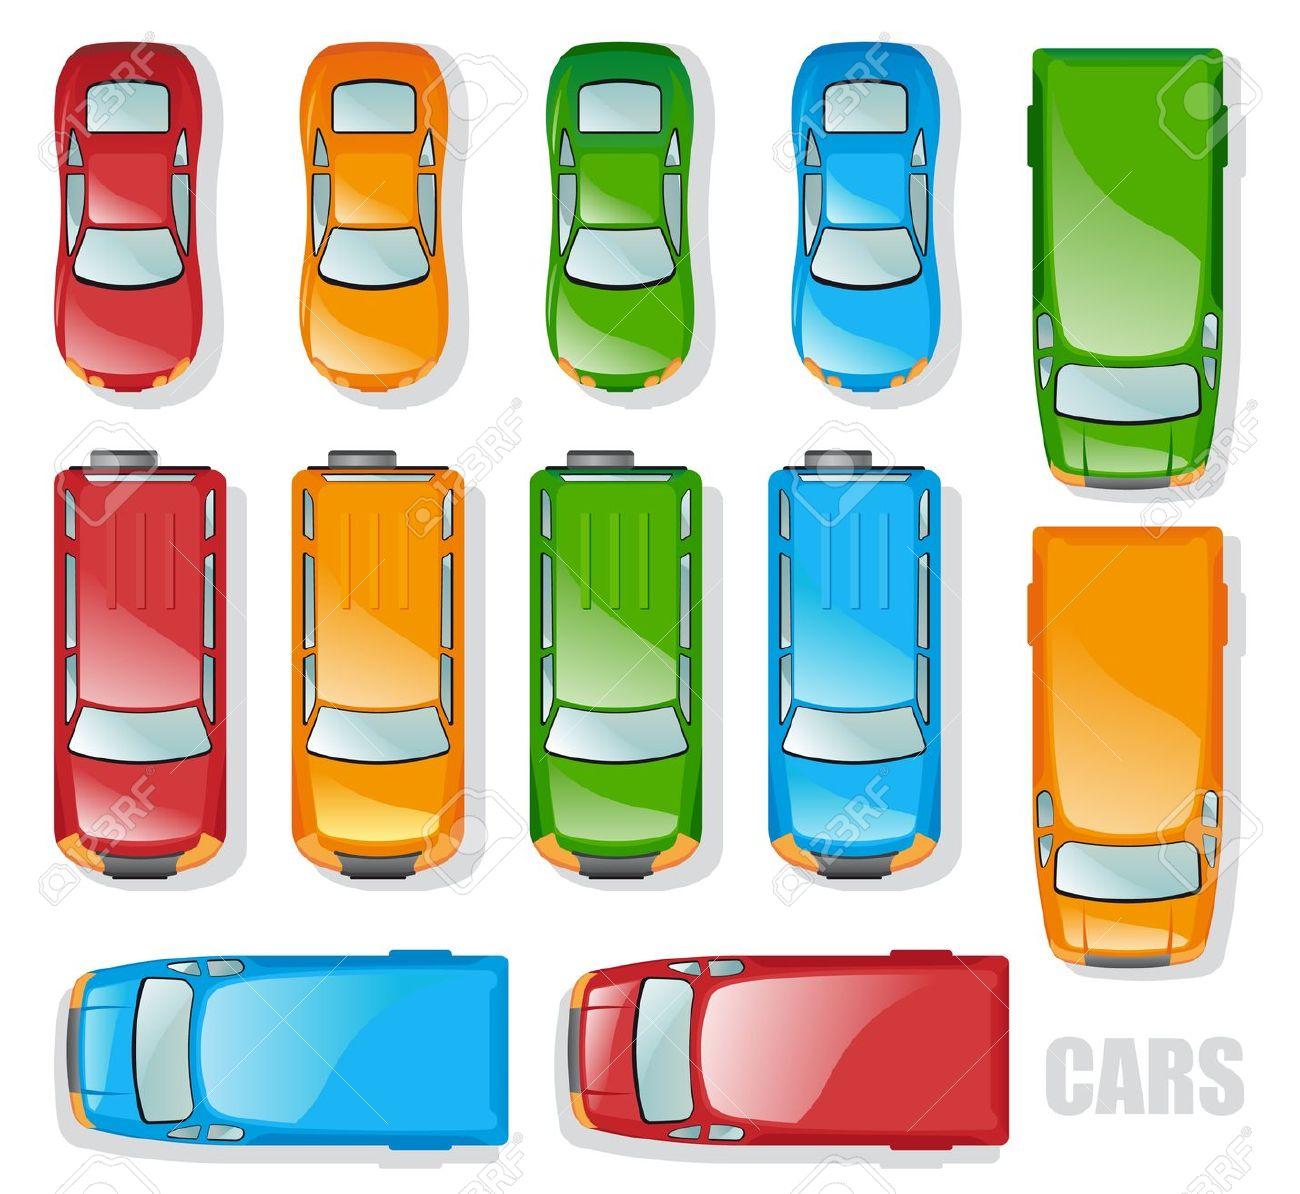 Auto von oben clipart. Cars and minibuses the